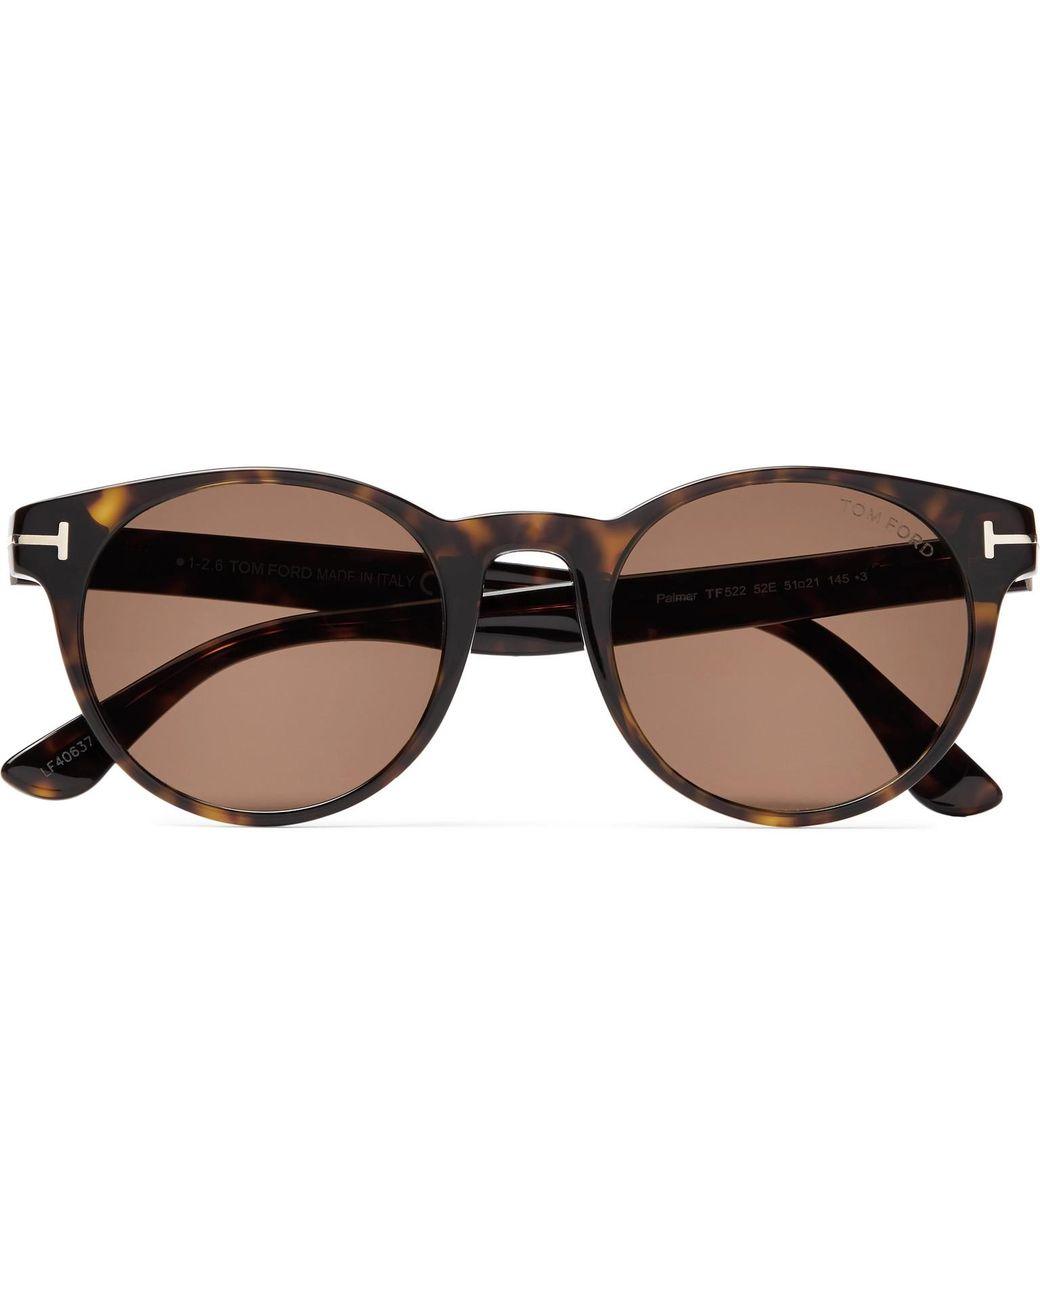 e3c491f128d1 Tom Ford Palmer Round-frame Tortoiseshell Acetate Sunglasses in ...